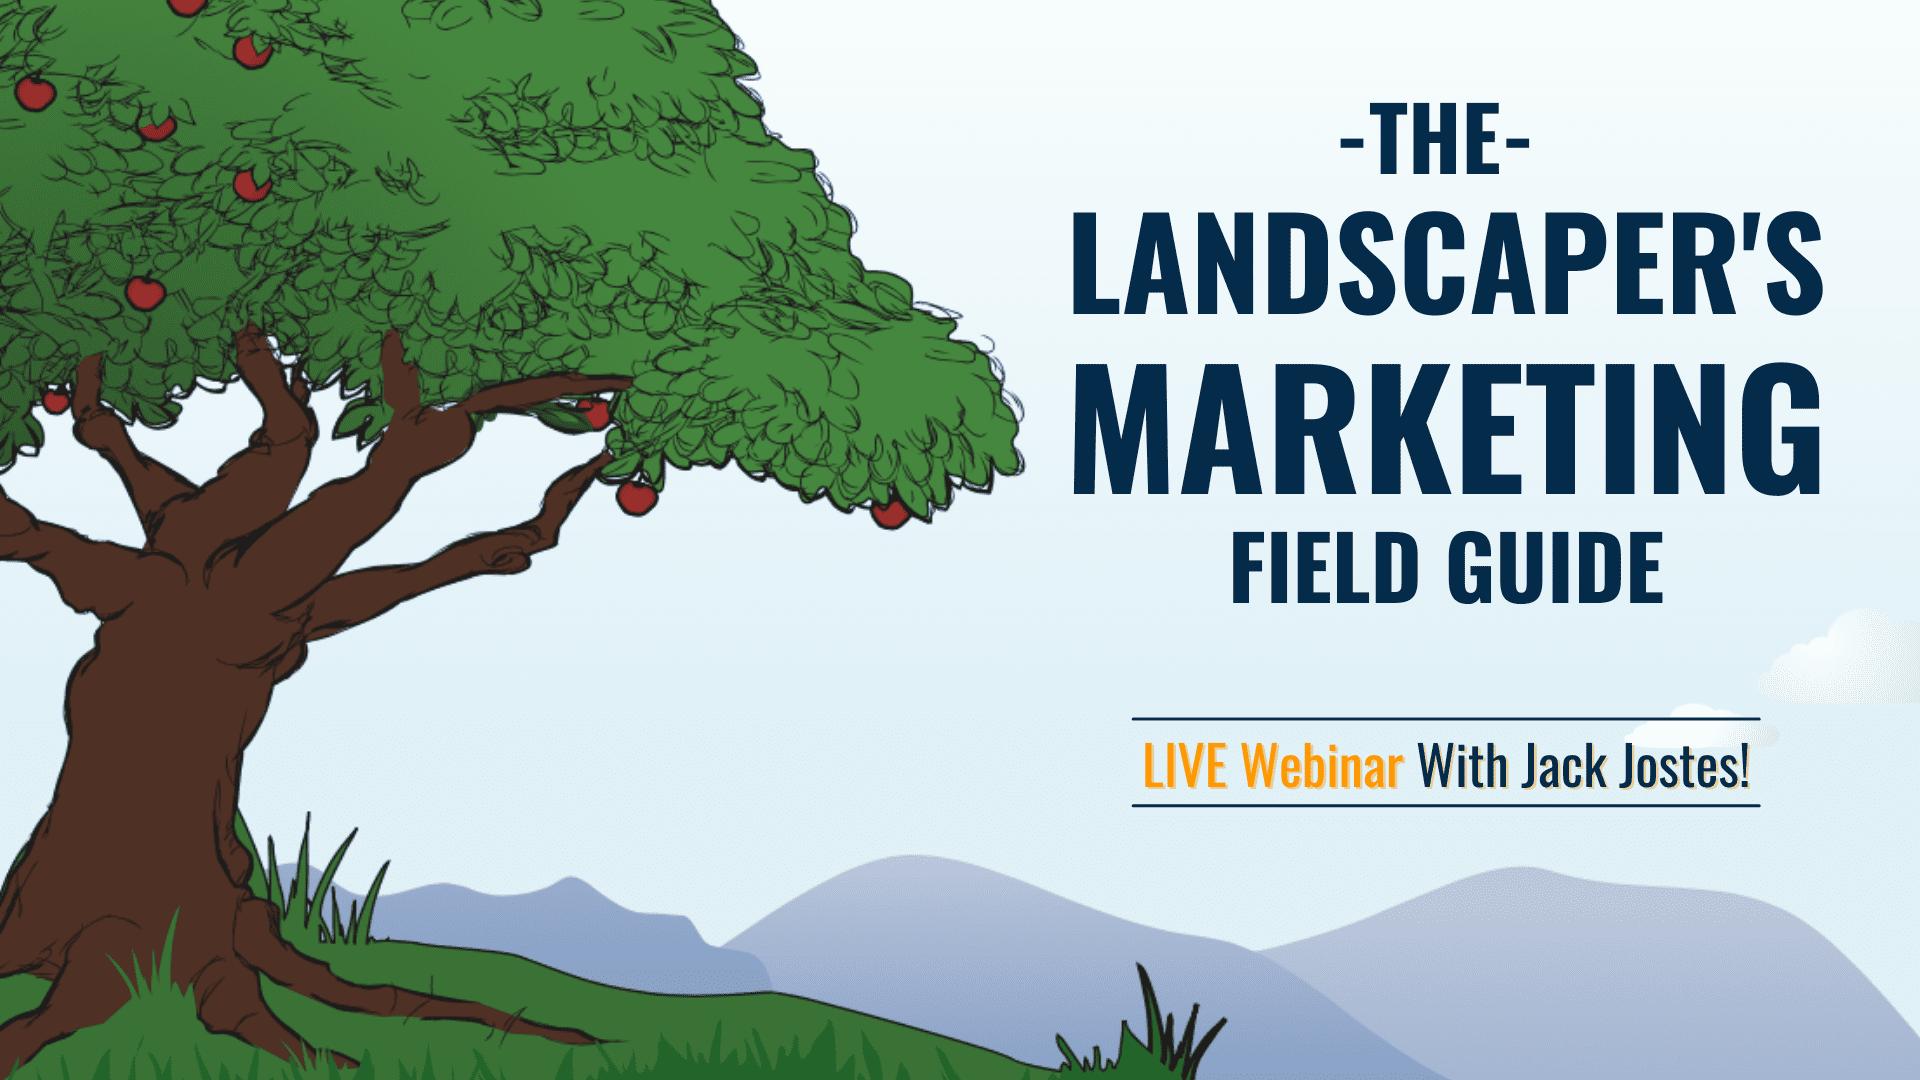 The Landscaper's Marketing Field Guide